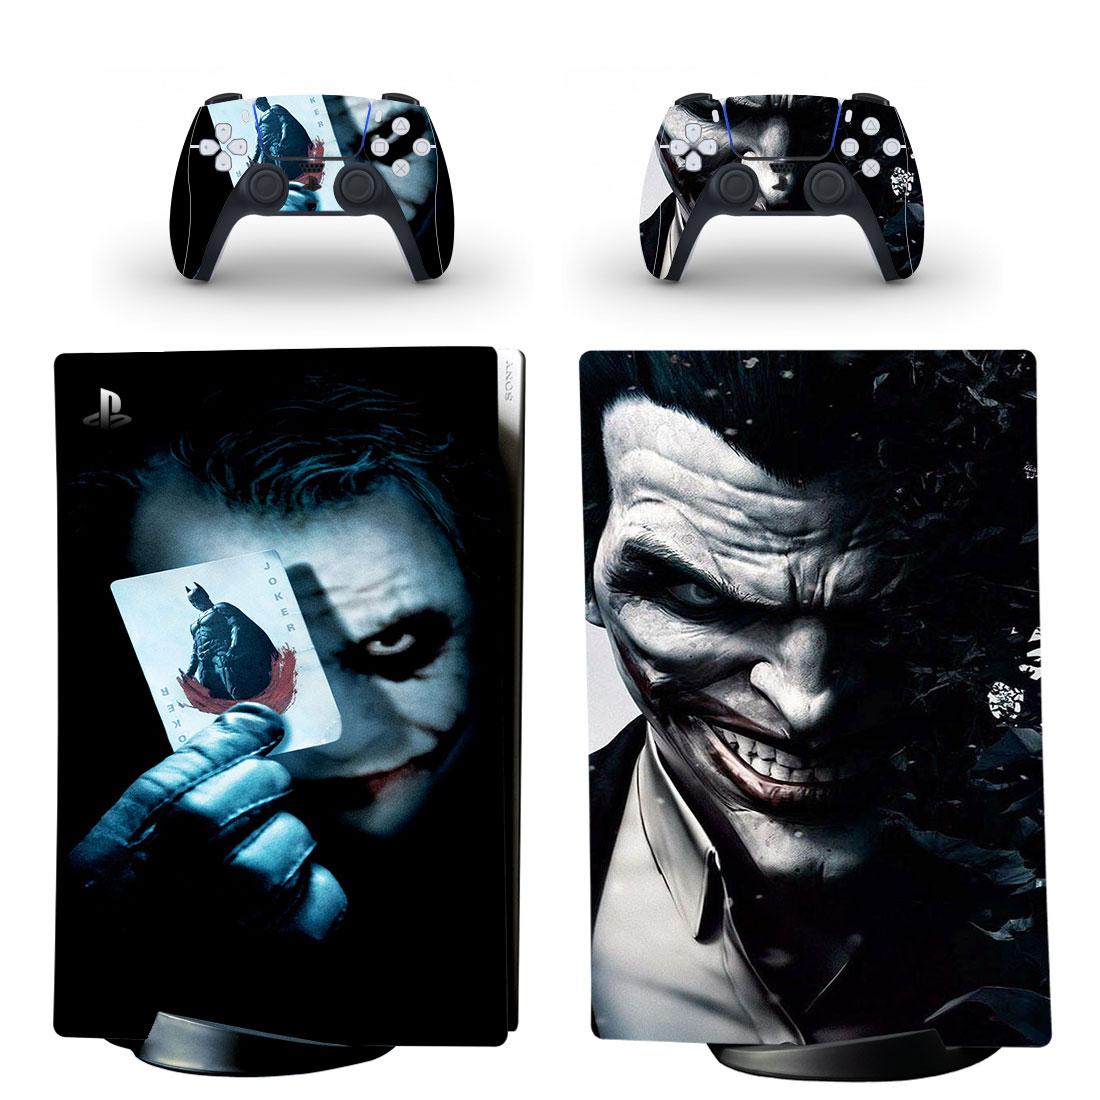 Joker PS5 Digital Edition Skin Sticker Decal Design 5